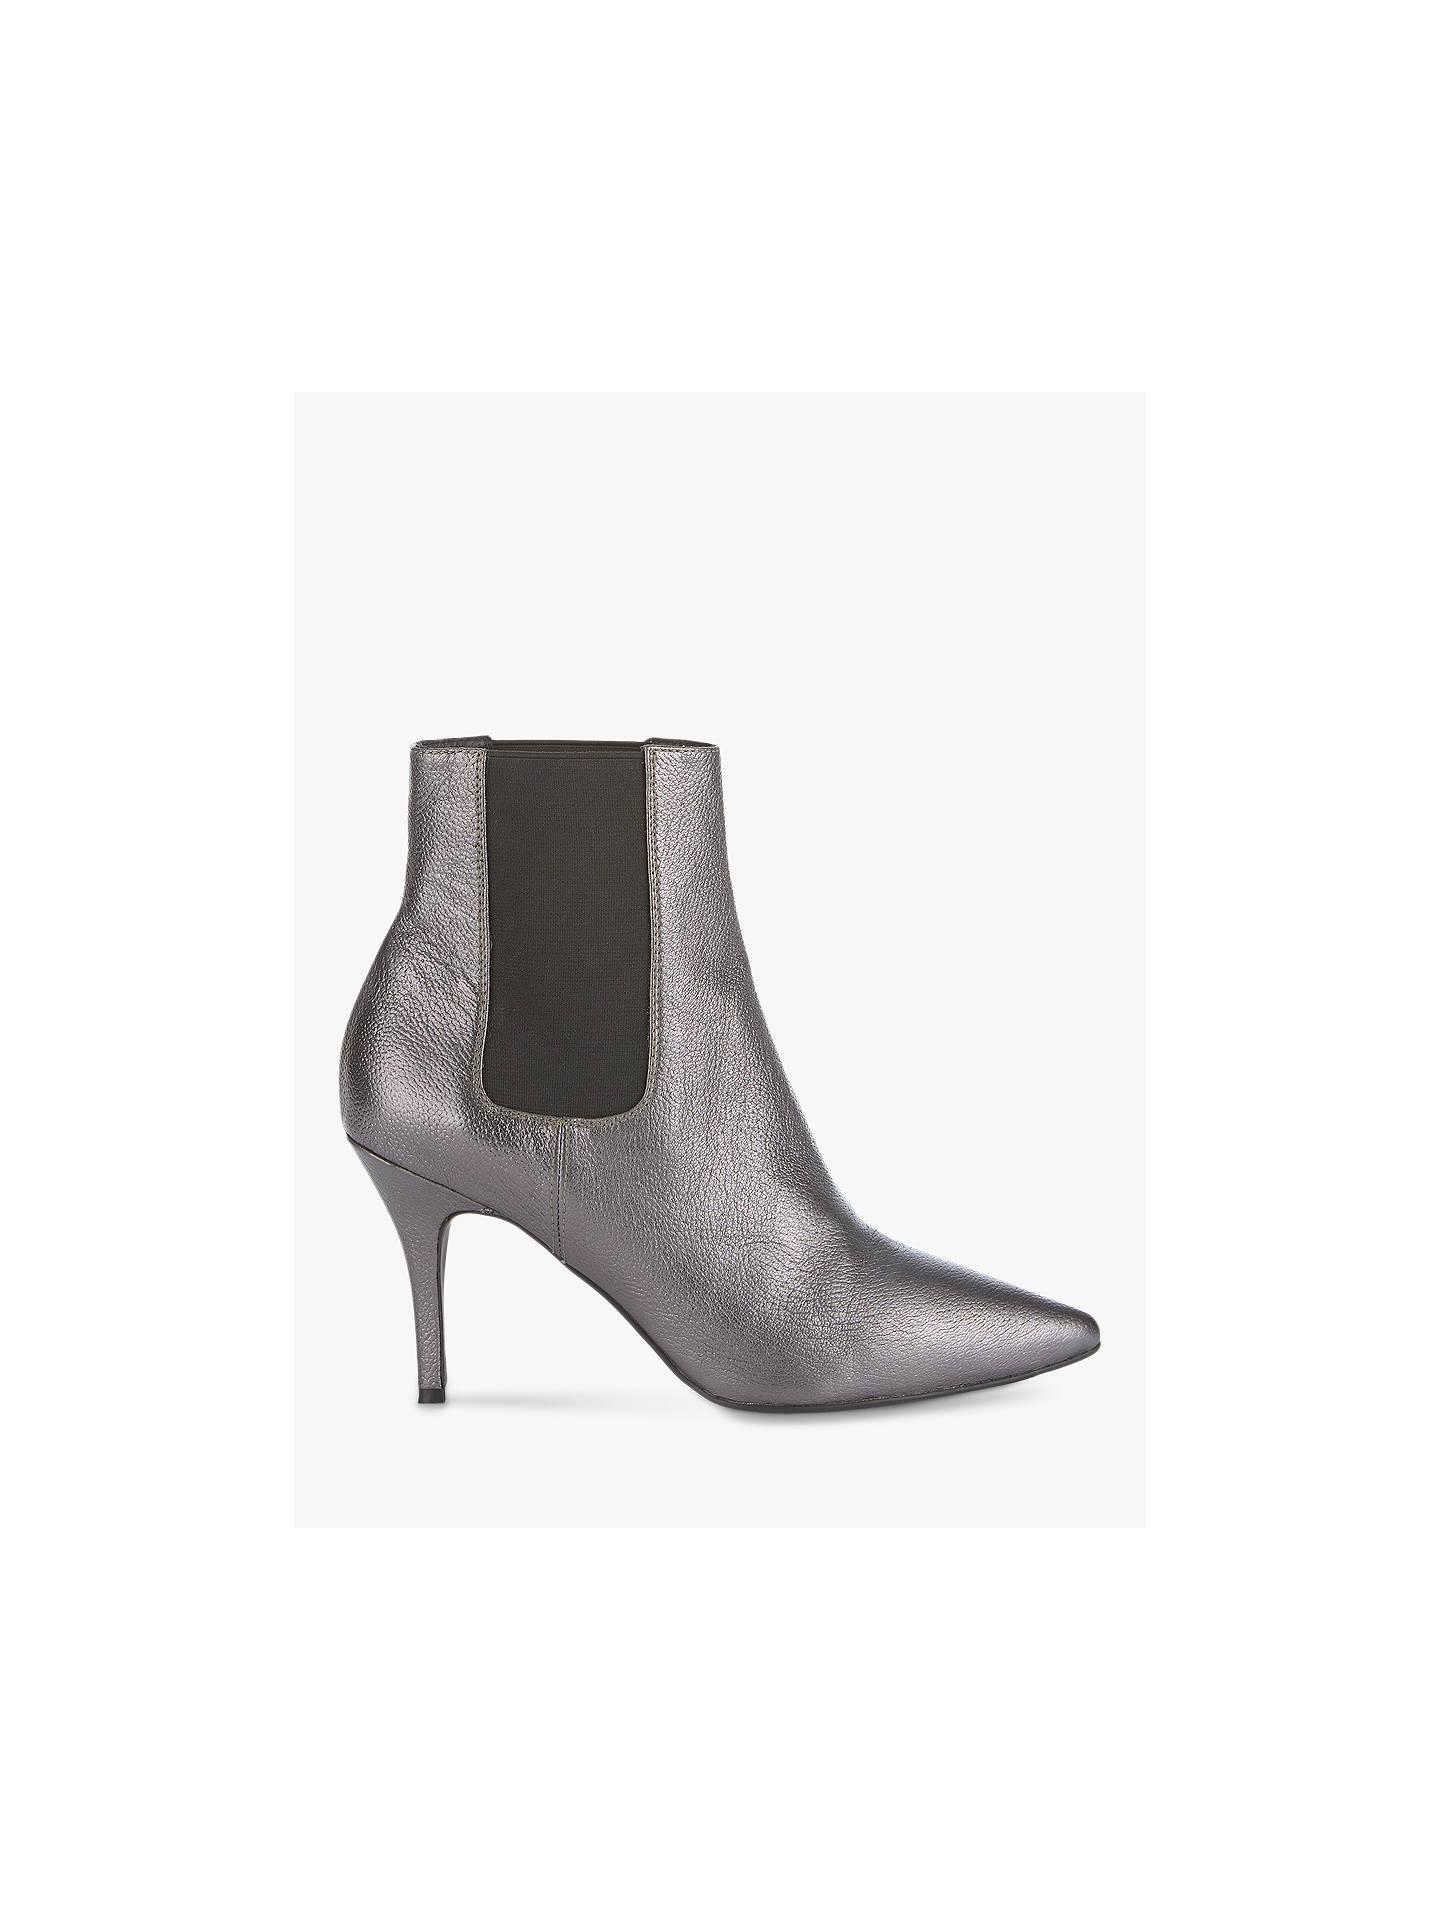 cf62bcb2272b3 Buy Mint Velvet Zara Metallic Leather Stiletto Heel Ankle Boots, Gunmetal,  3 Online at ...